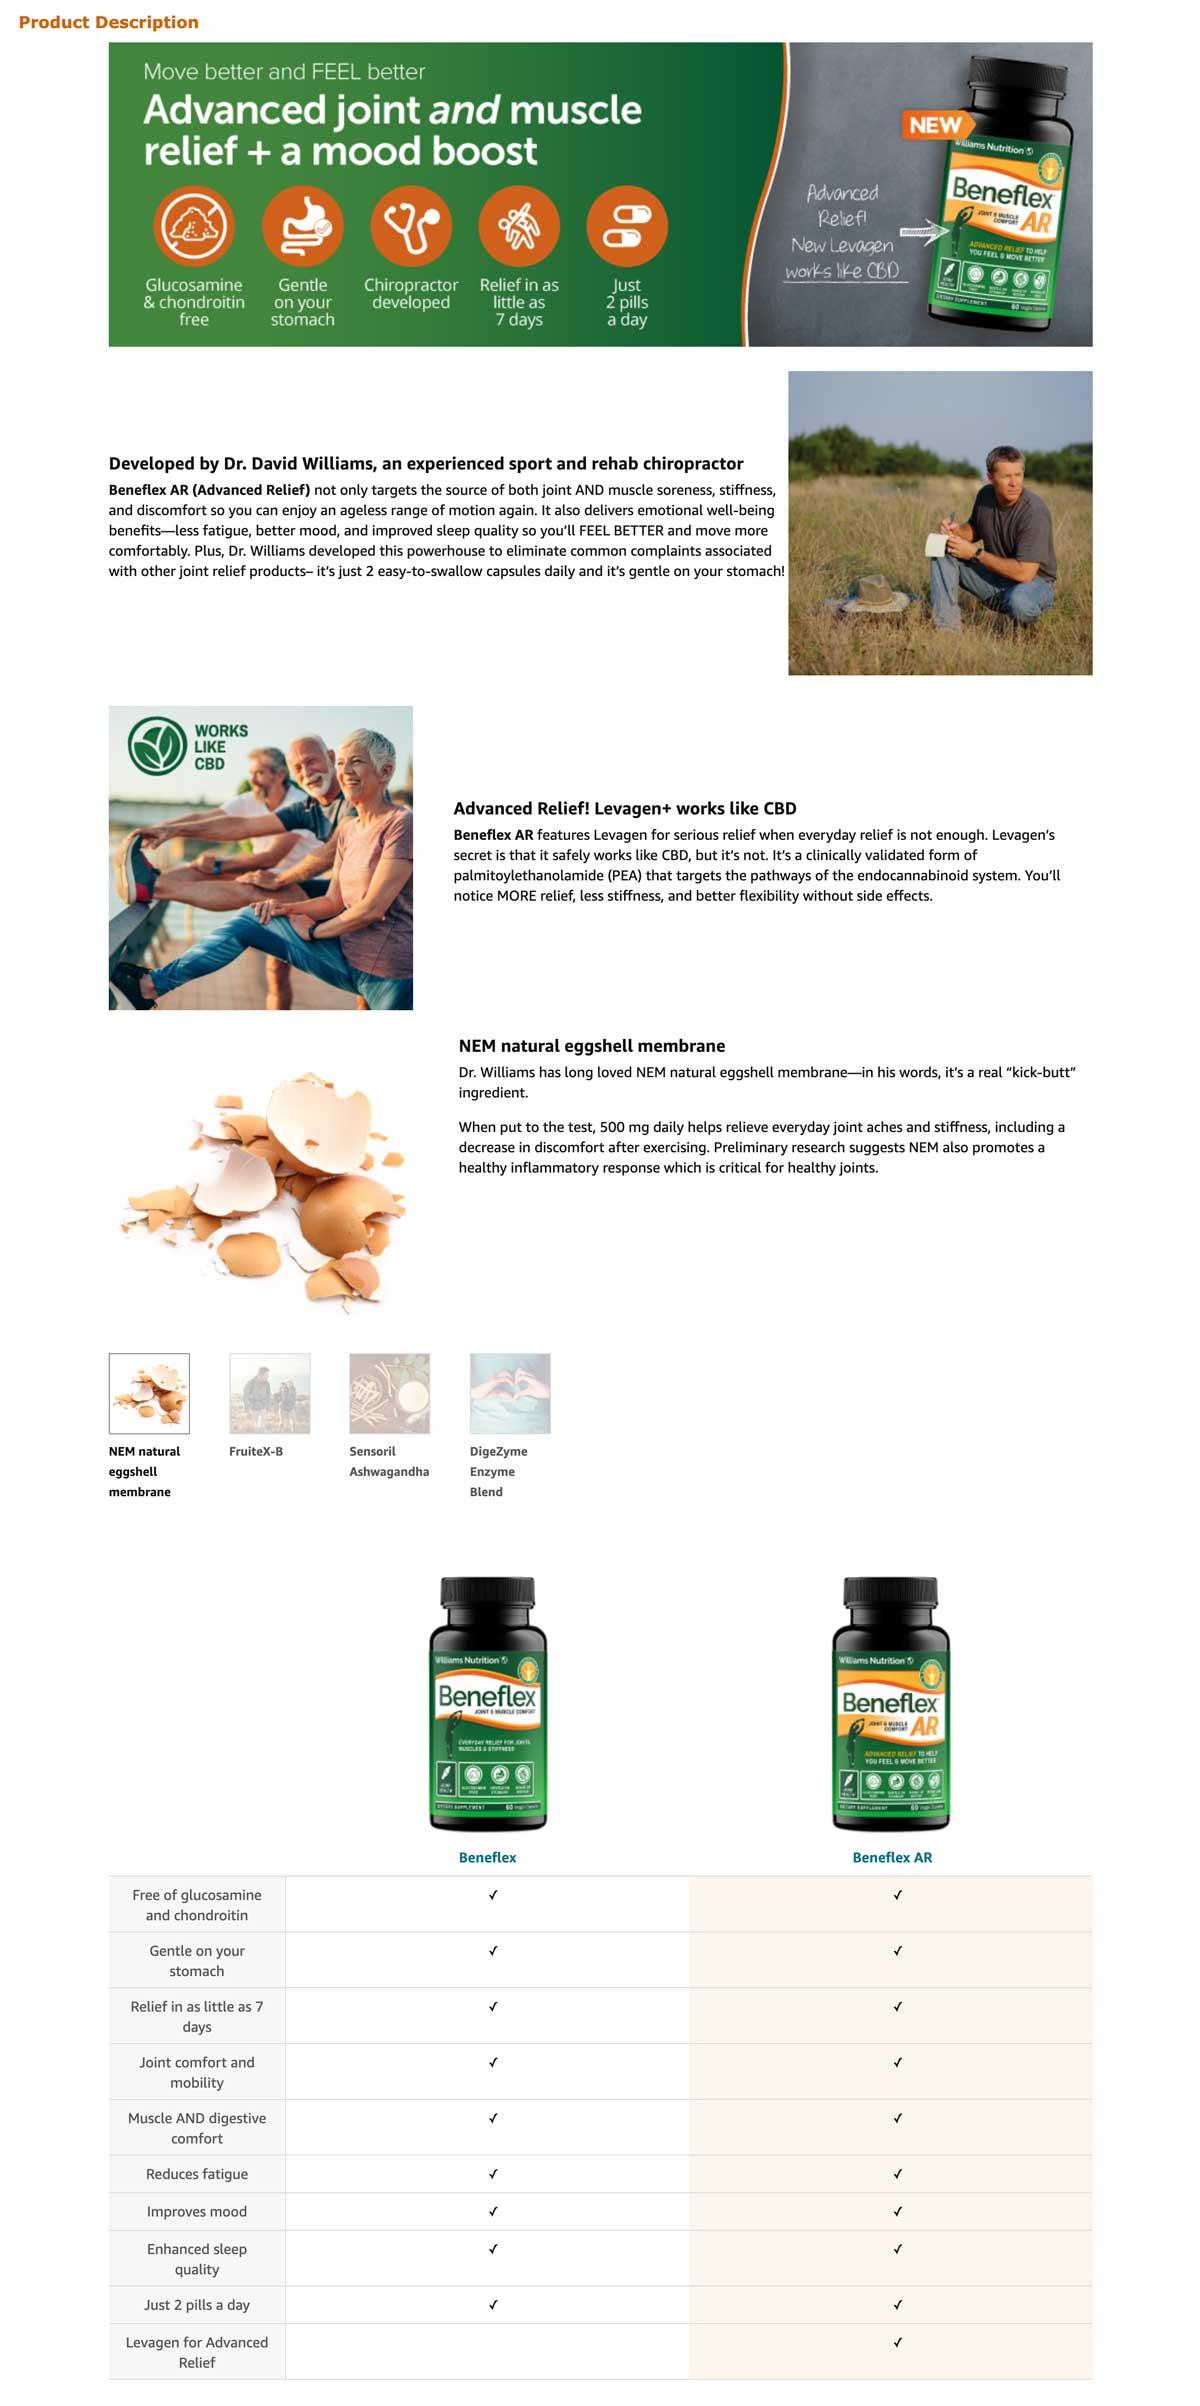 Beneflex AR Enhanced Brand Content